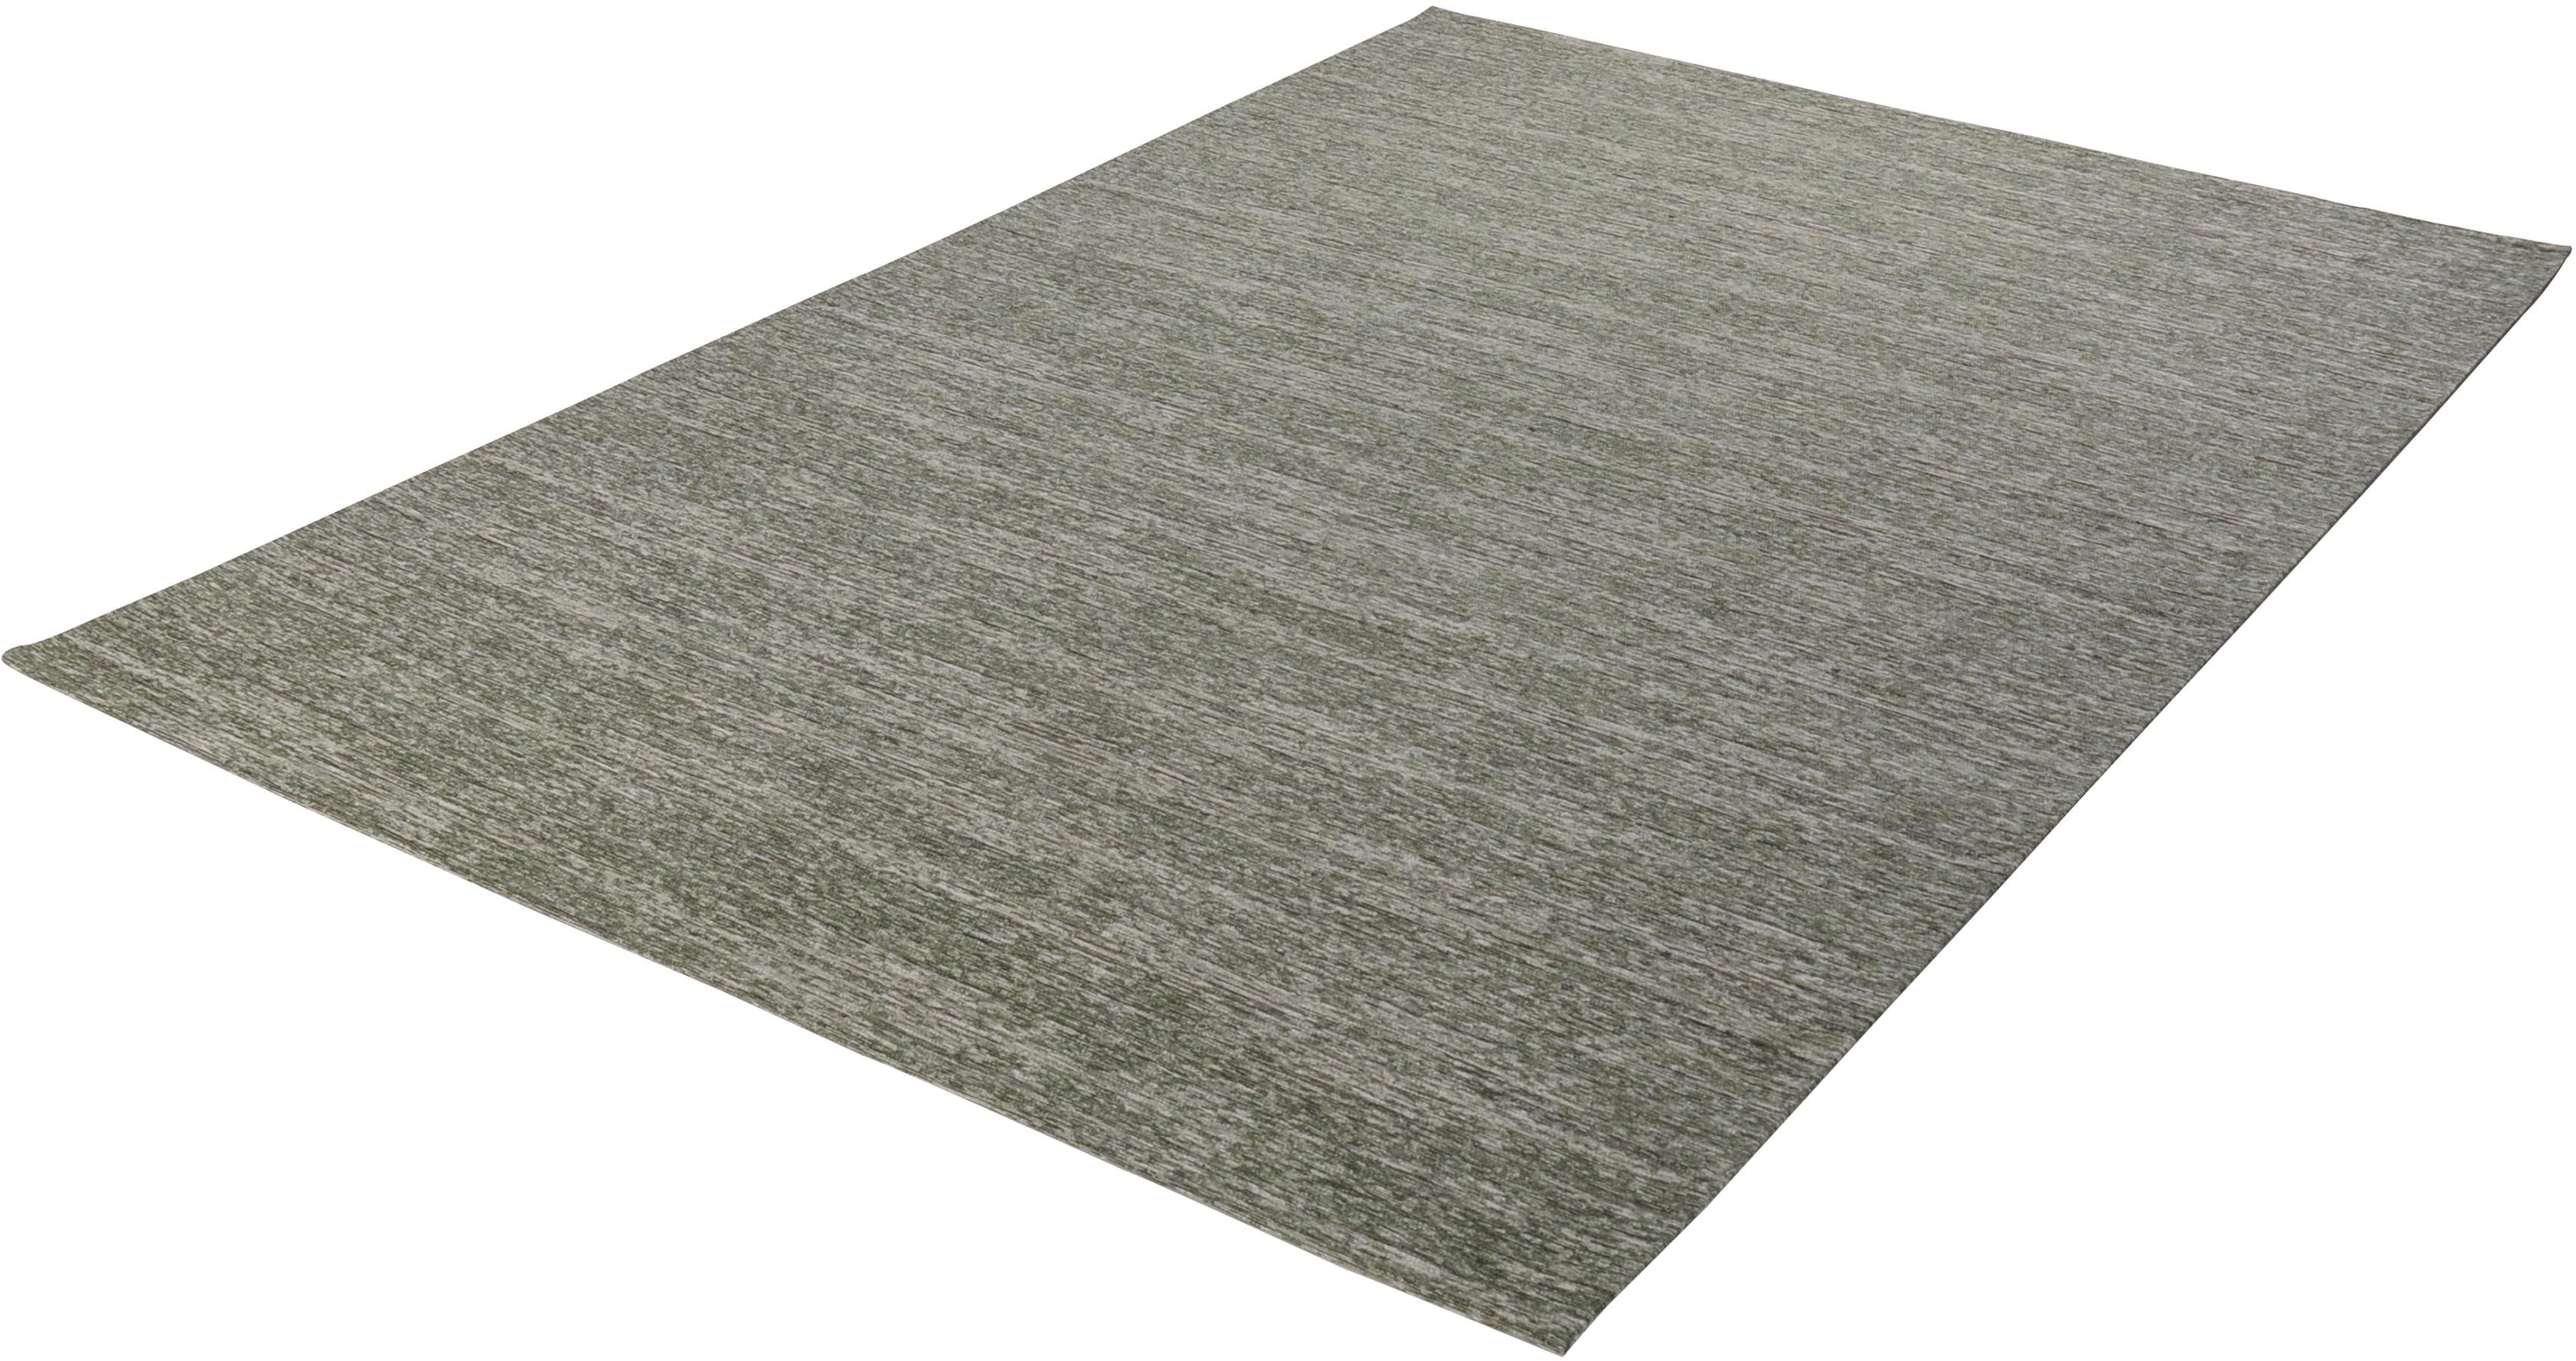 teppich kapstadt uni theko rechteckig h he 5 mm. Black Bedroom Furniture Sets. Home Design Ideas